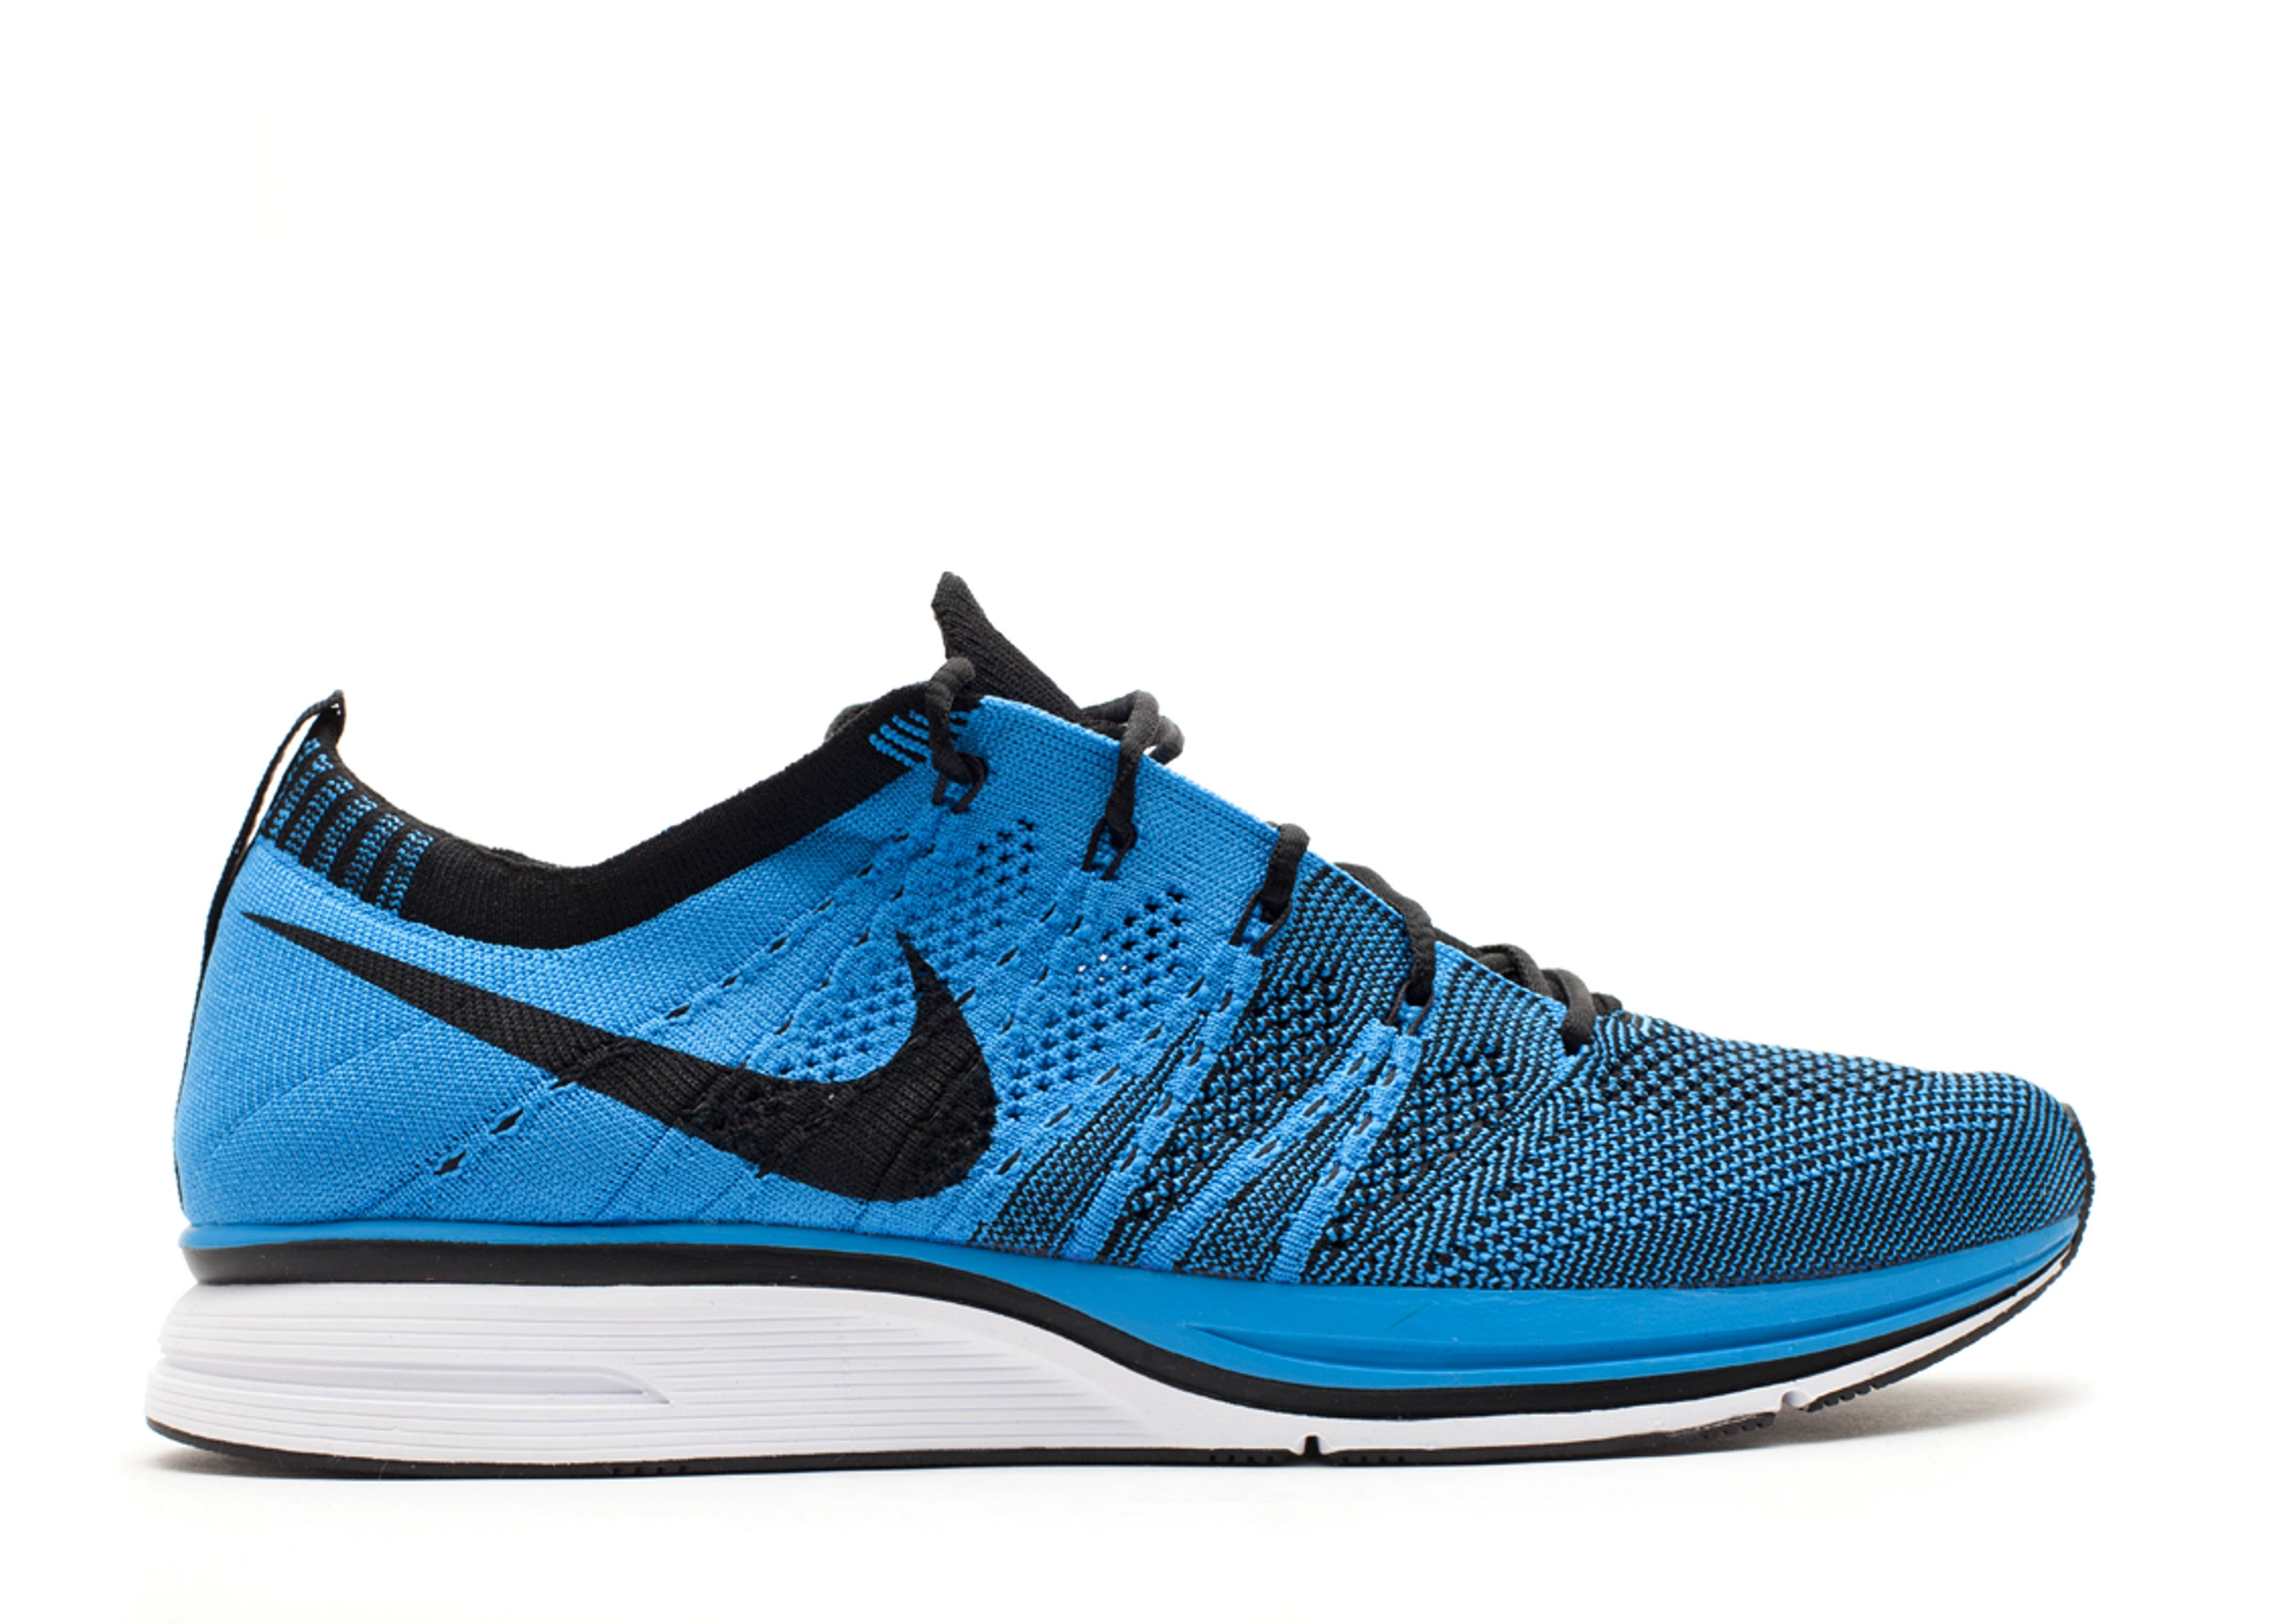 7666a28ba1f0a Flyknit Trainer+ - Nike - 532984 440 - blue glow blue tint-black ...